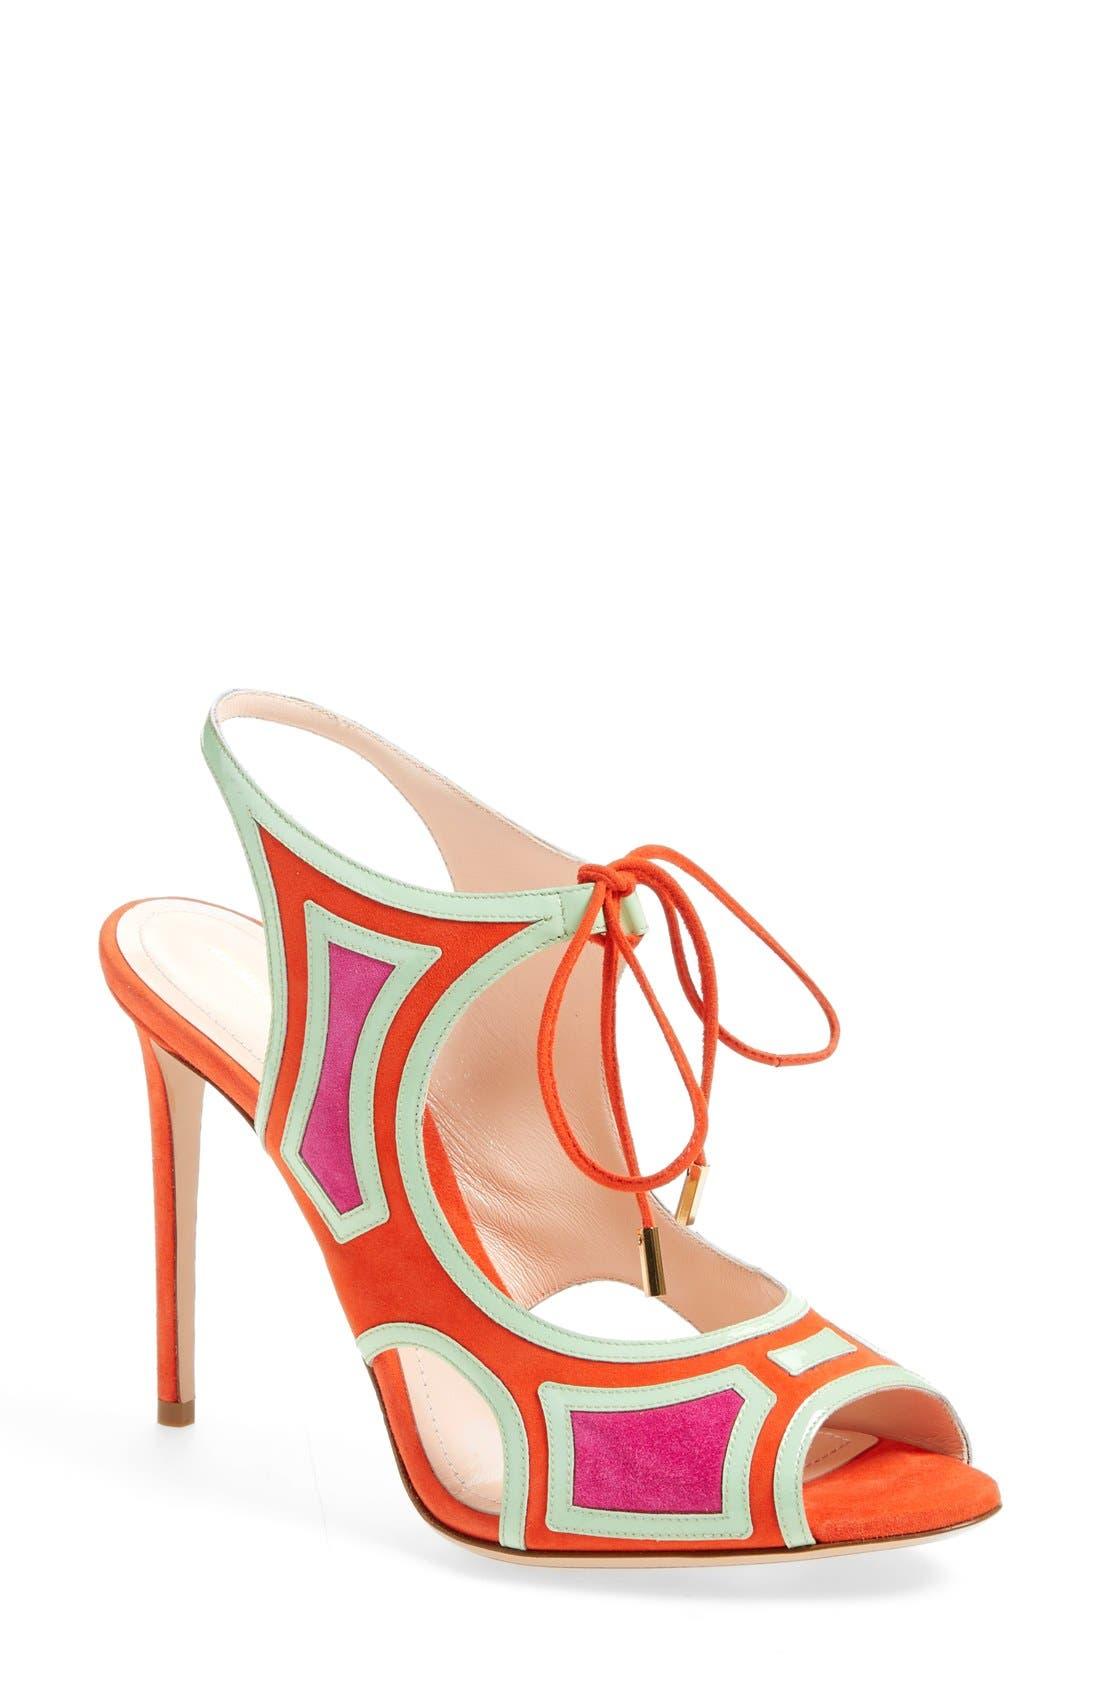 Main Image - Nicholas Kirkwood 'Outliner' Lace-Up Sandal (Women)